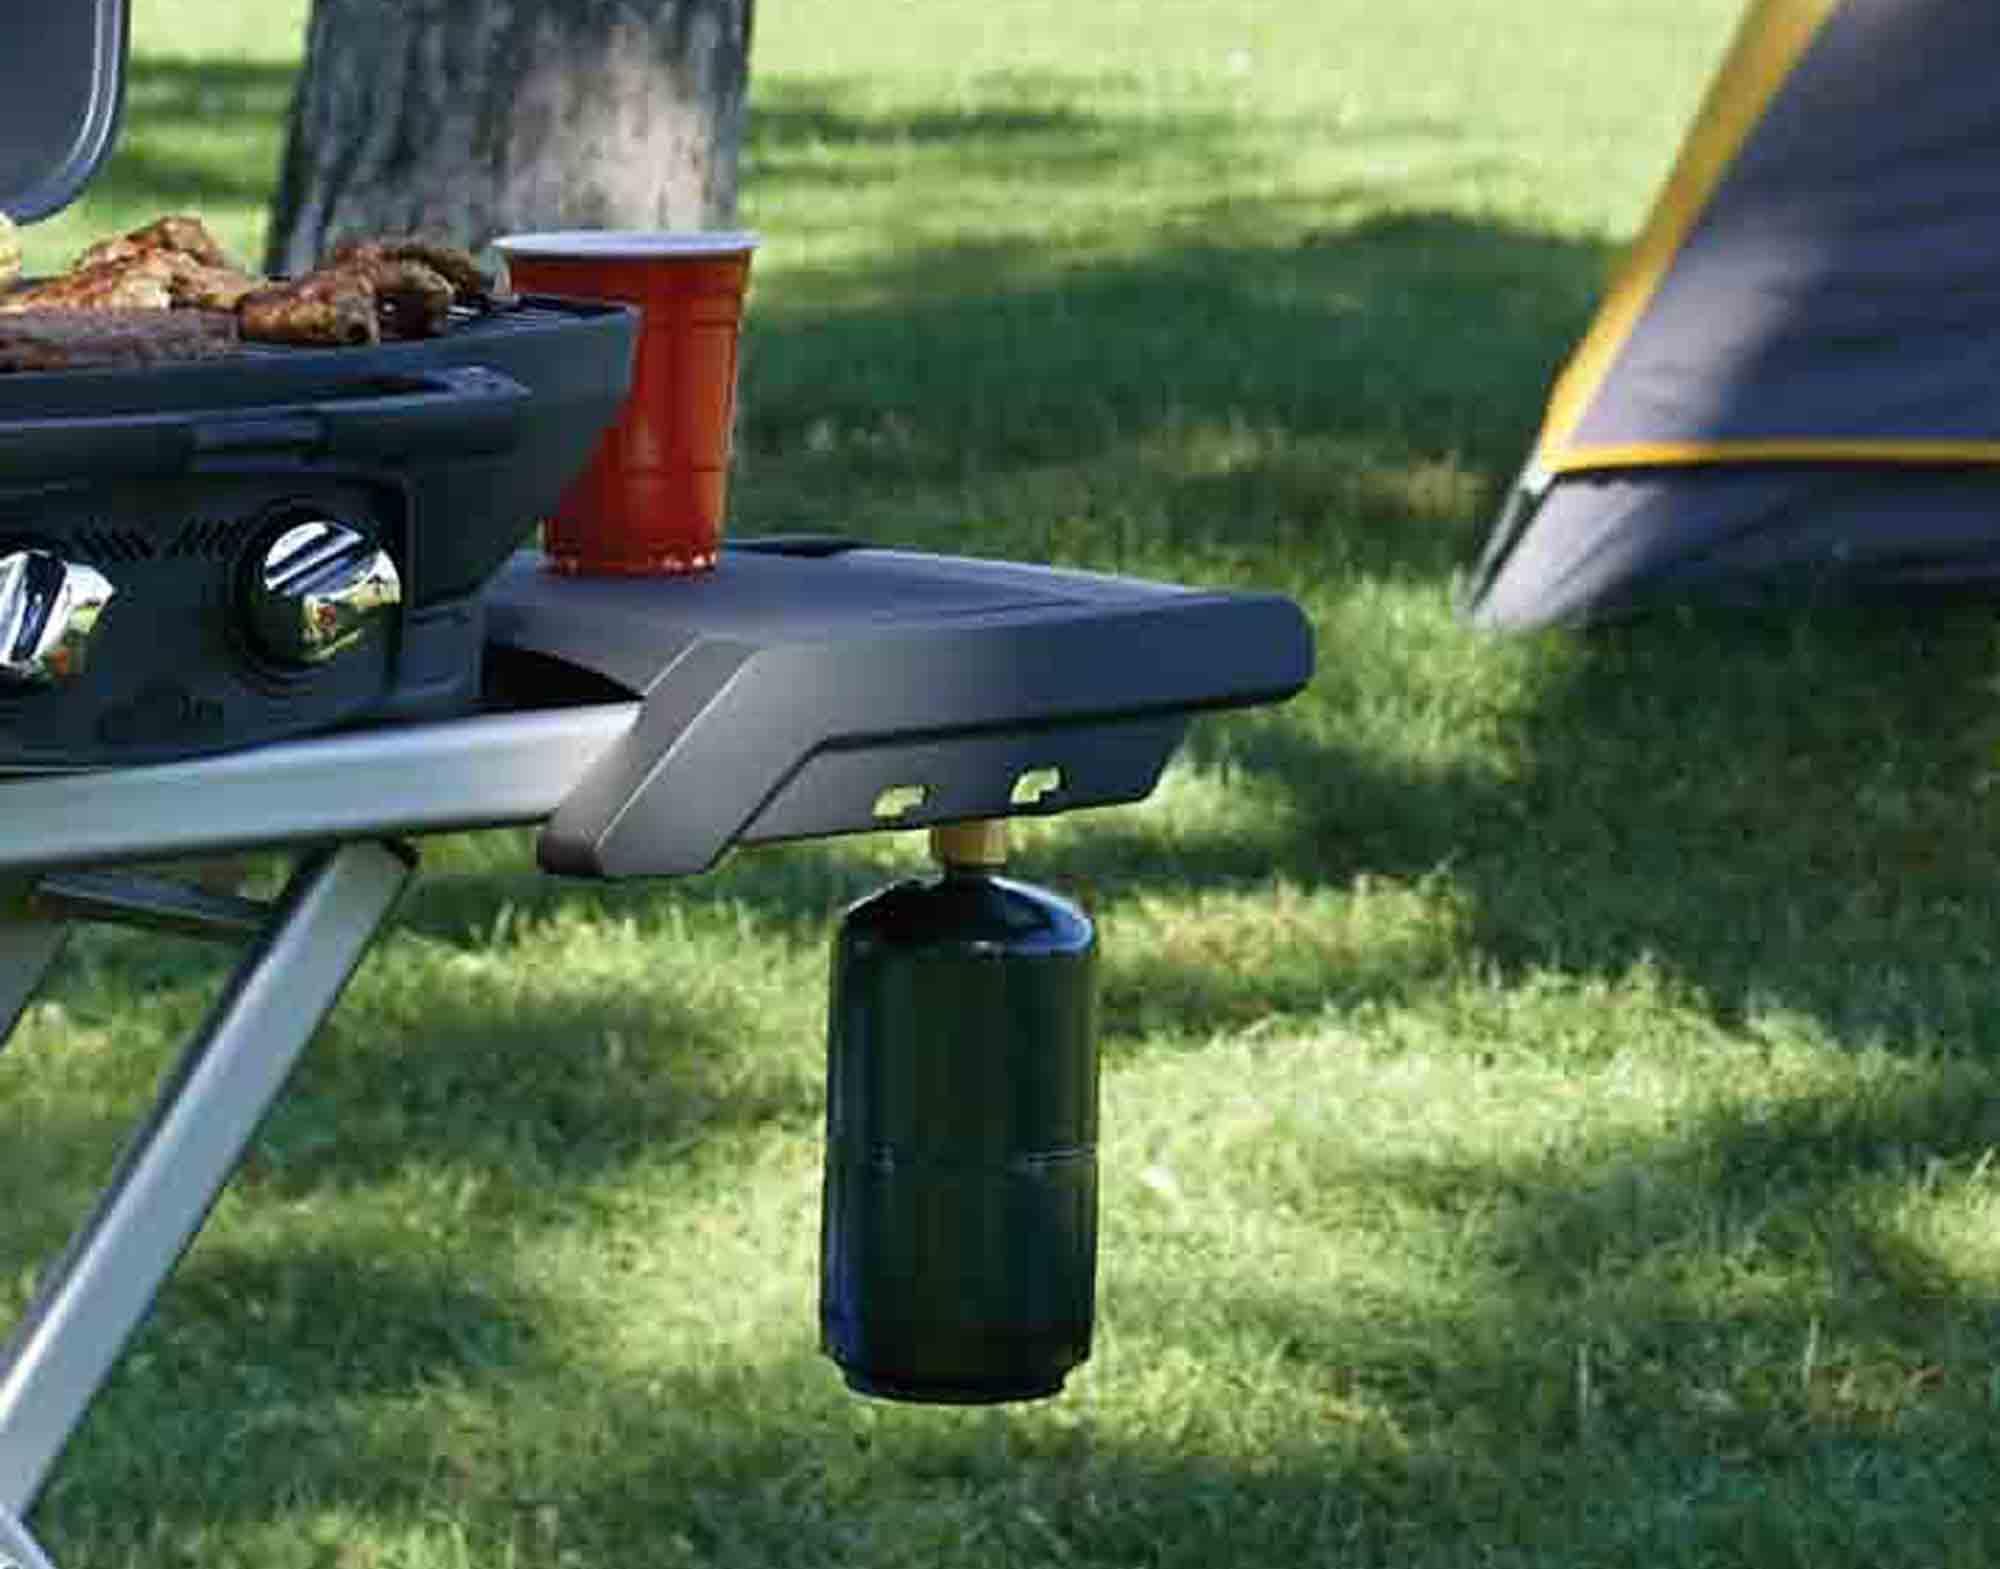 Landmann Gasgrill Druckminderer : Landmann kompakt tisch gasgrill grill grillzubehör schlauch